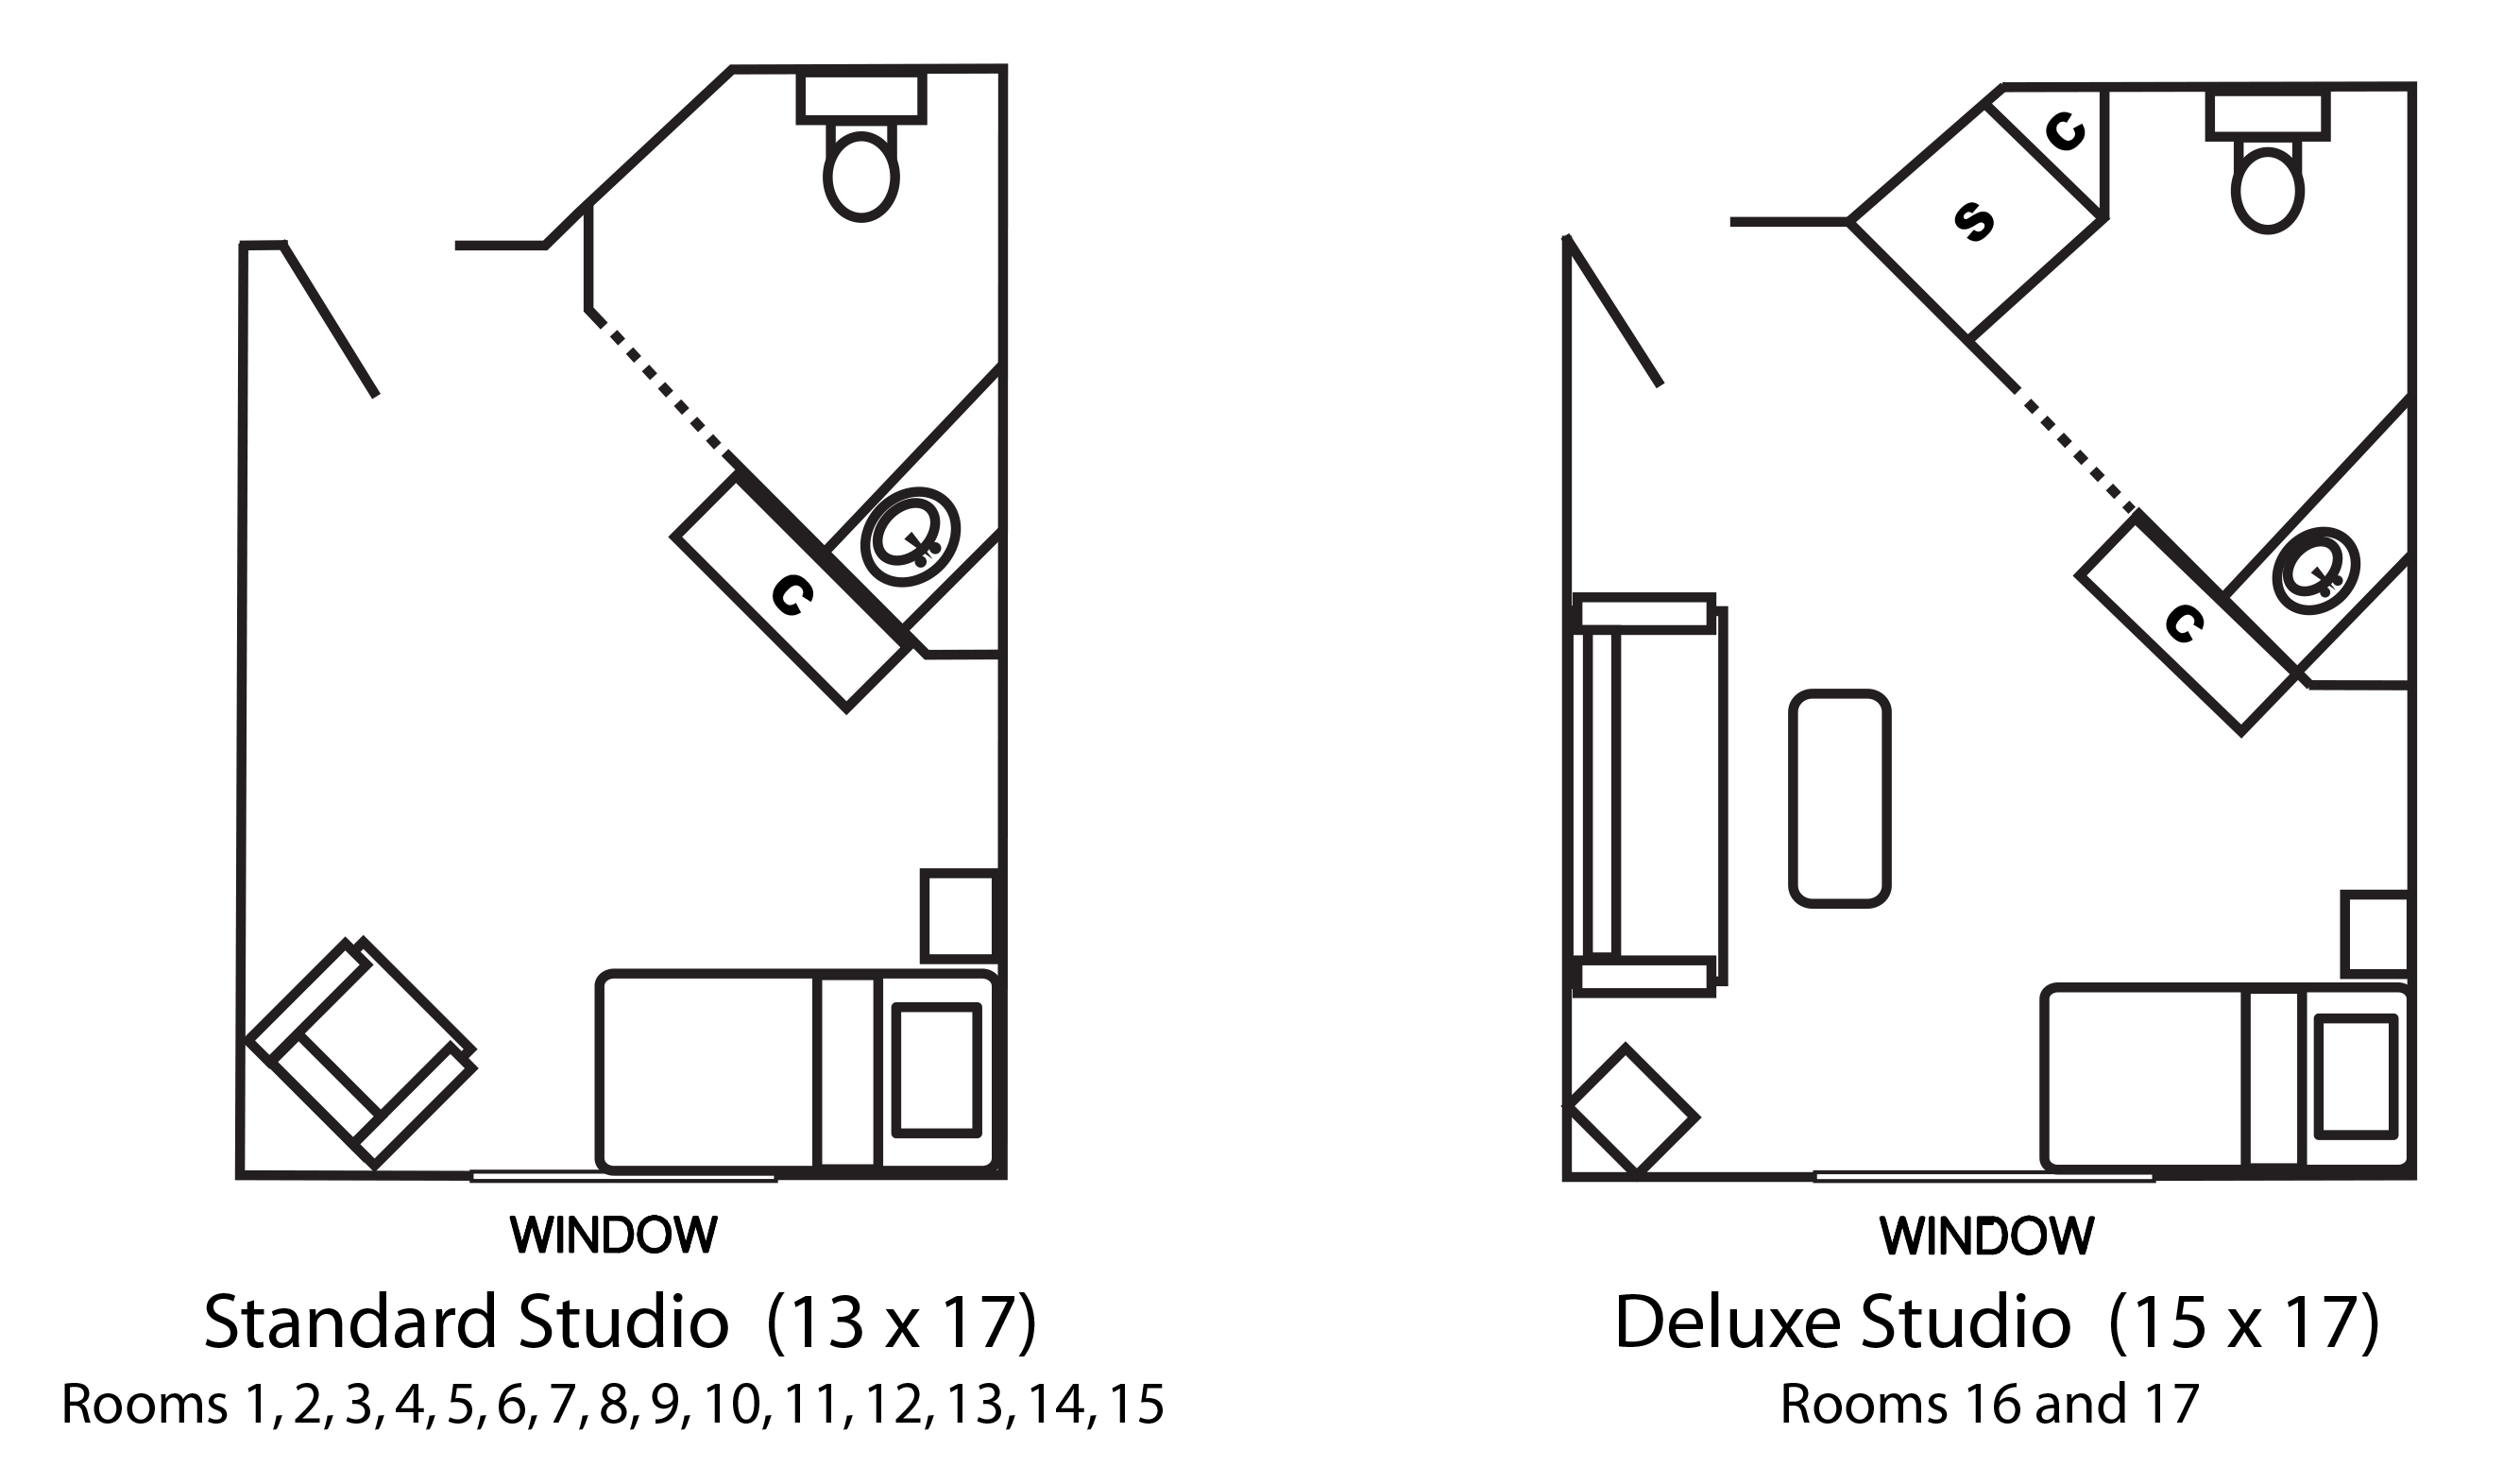 Nursing Home Room Design